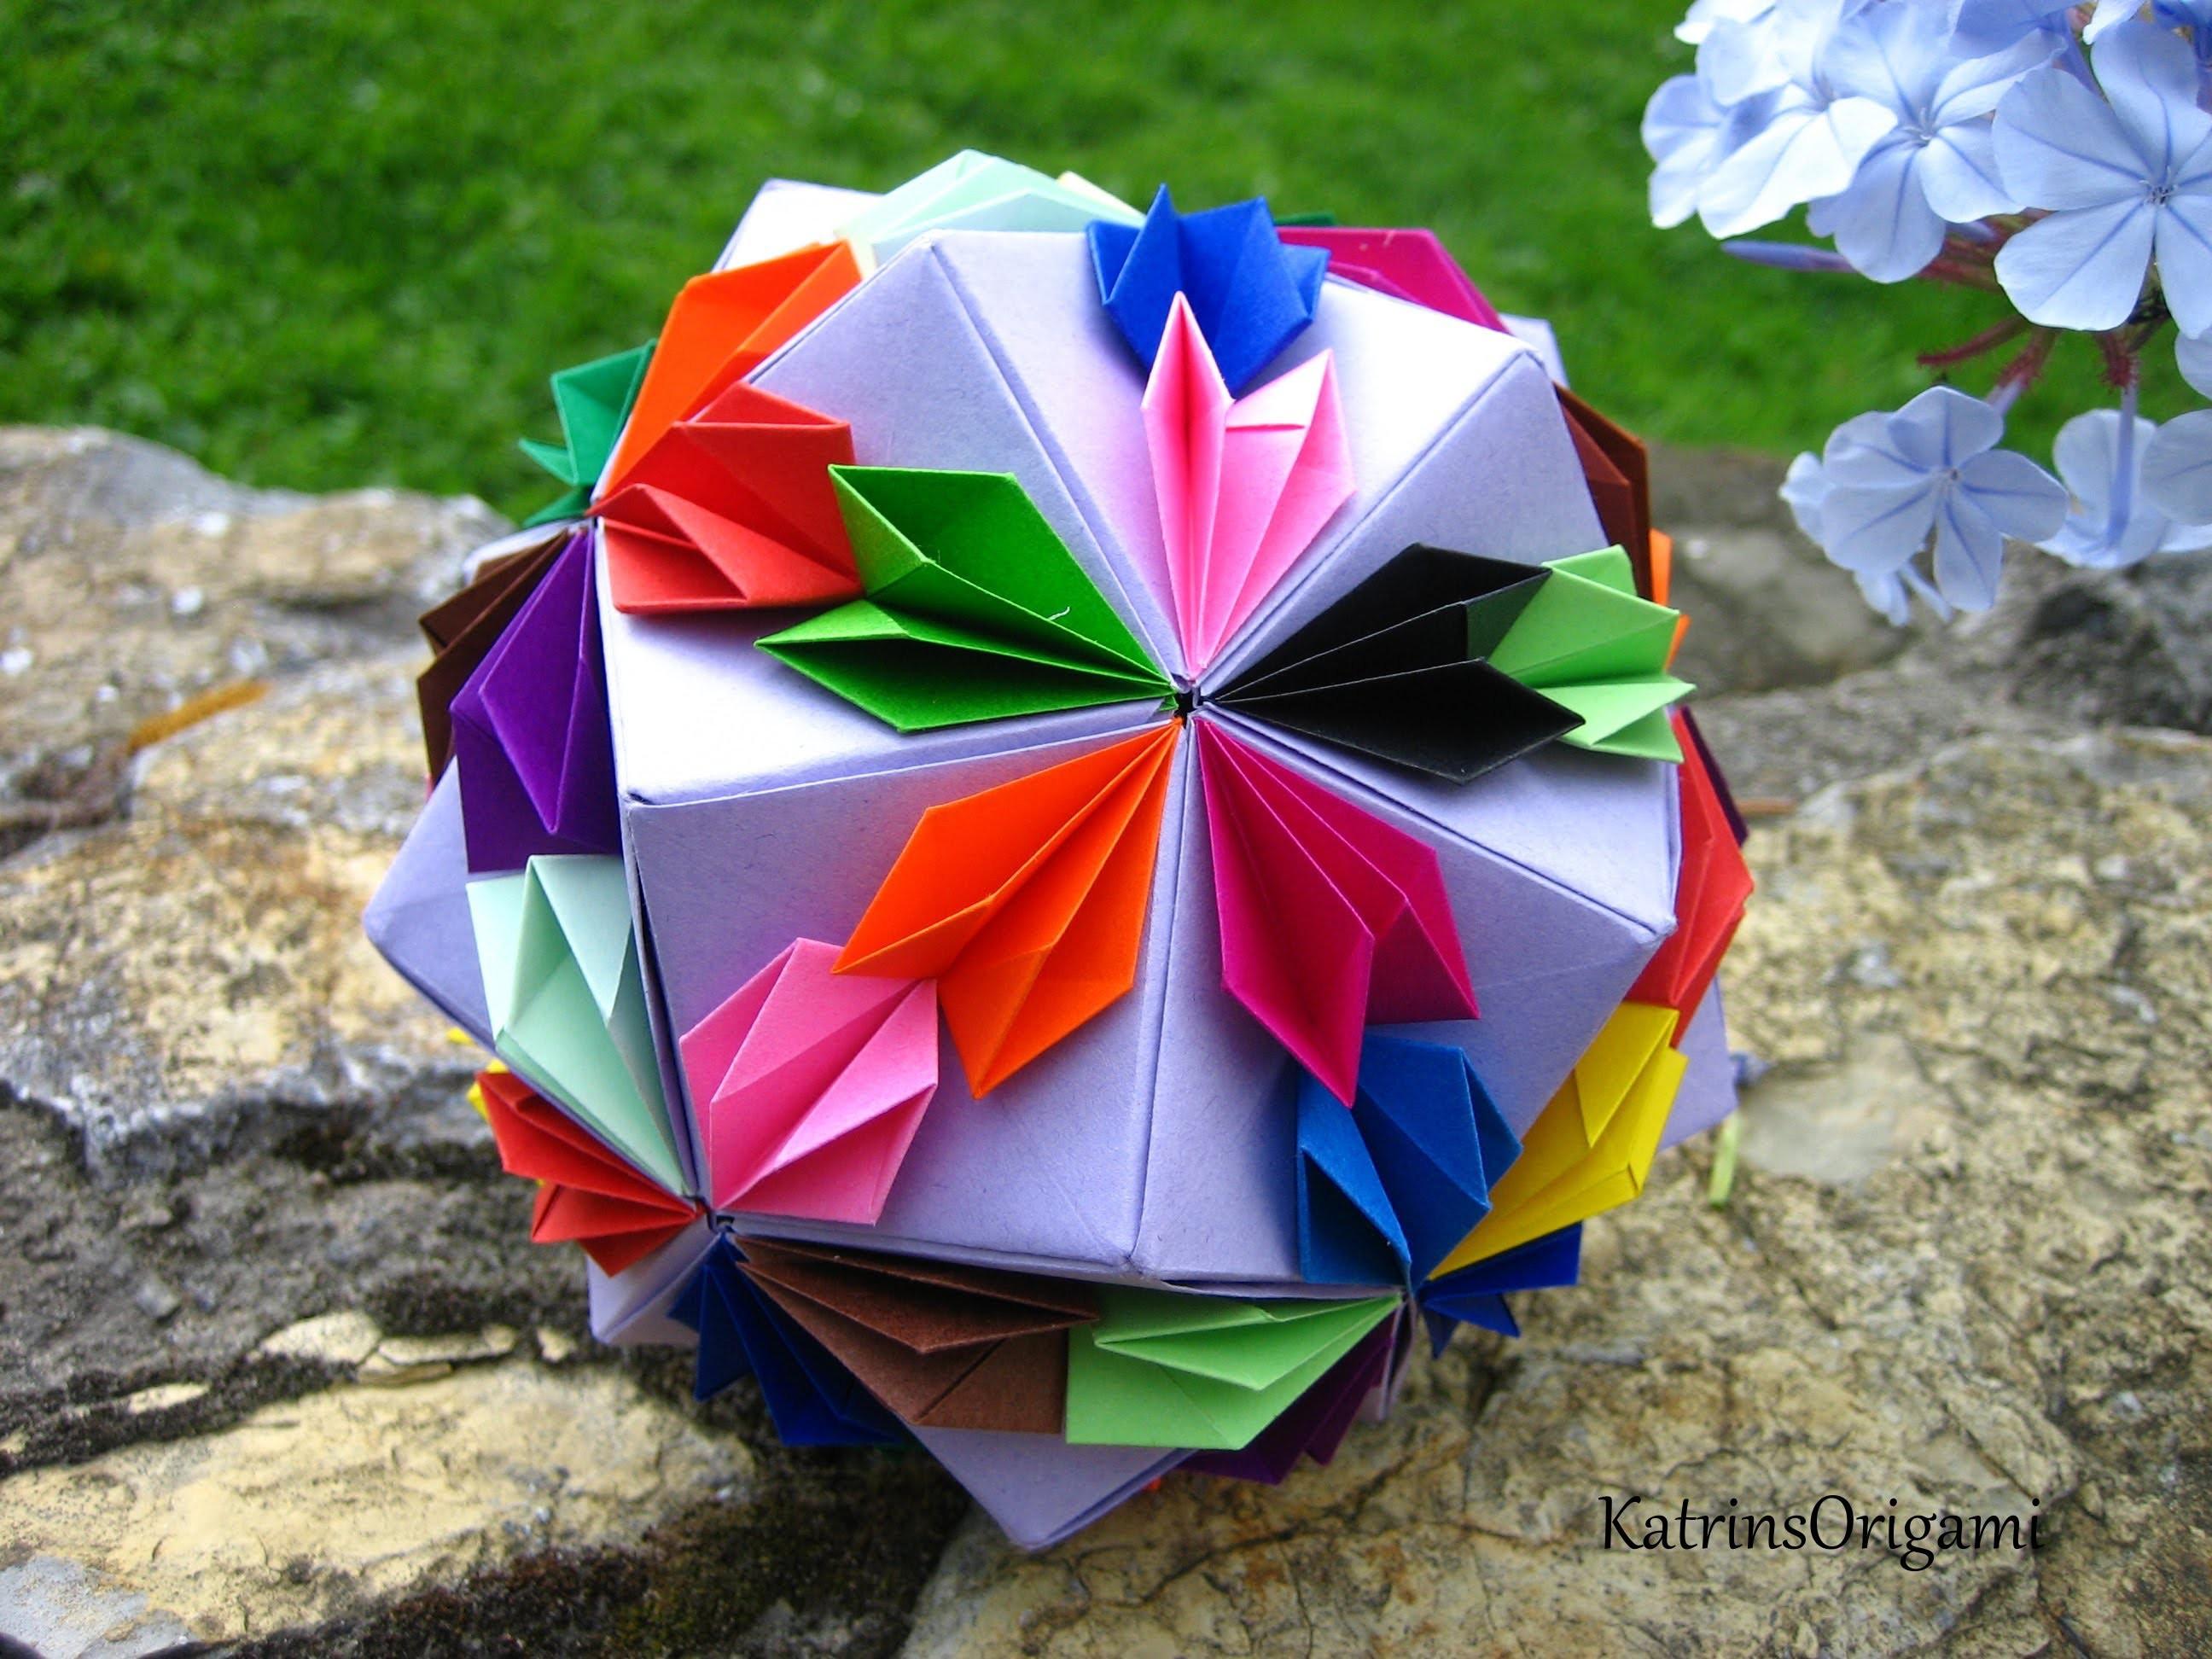 Origami ※ Confetti ※ Kusudama